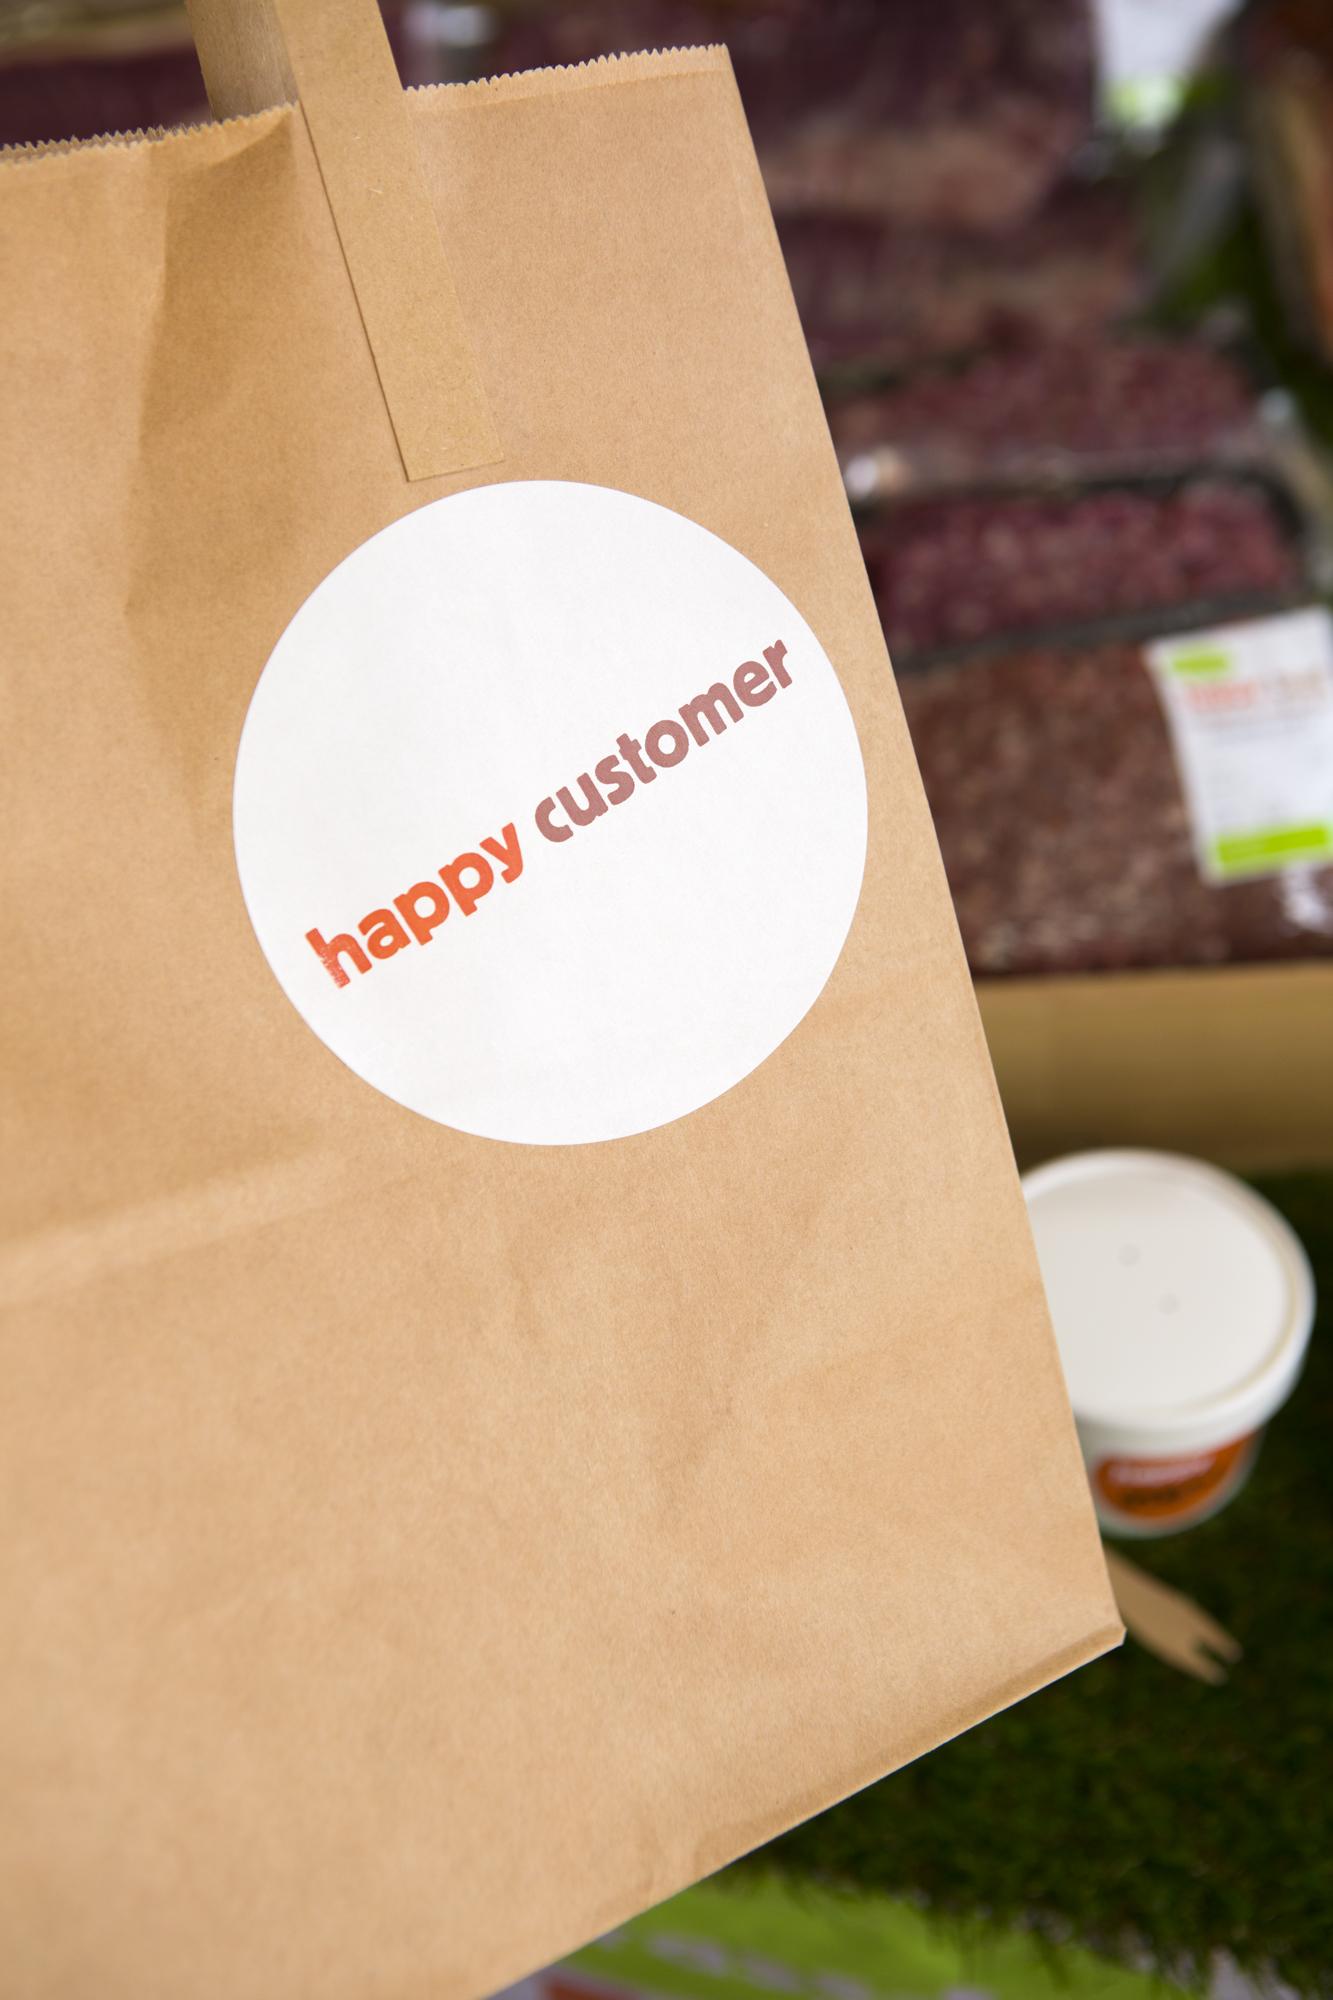 HB-HappyCustomer